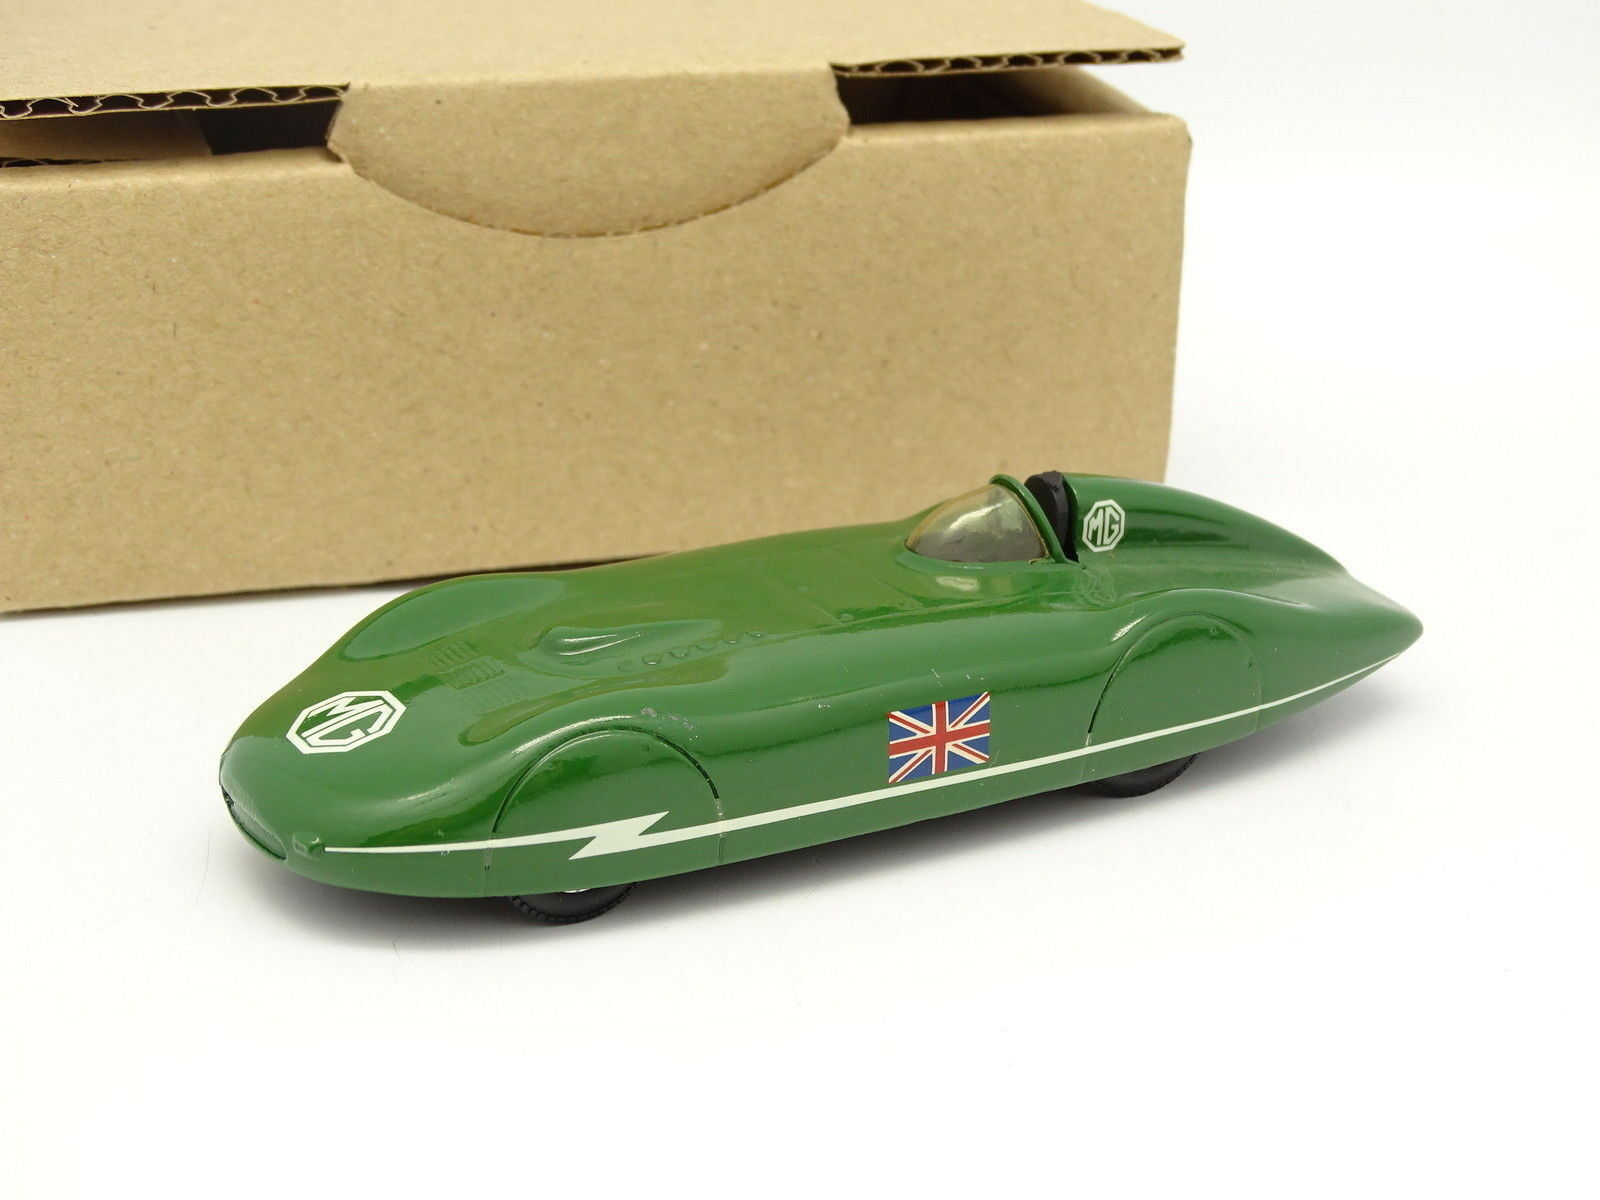 Western Models 1 43 - MG EX181 Land Speed Record Car 1959